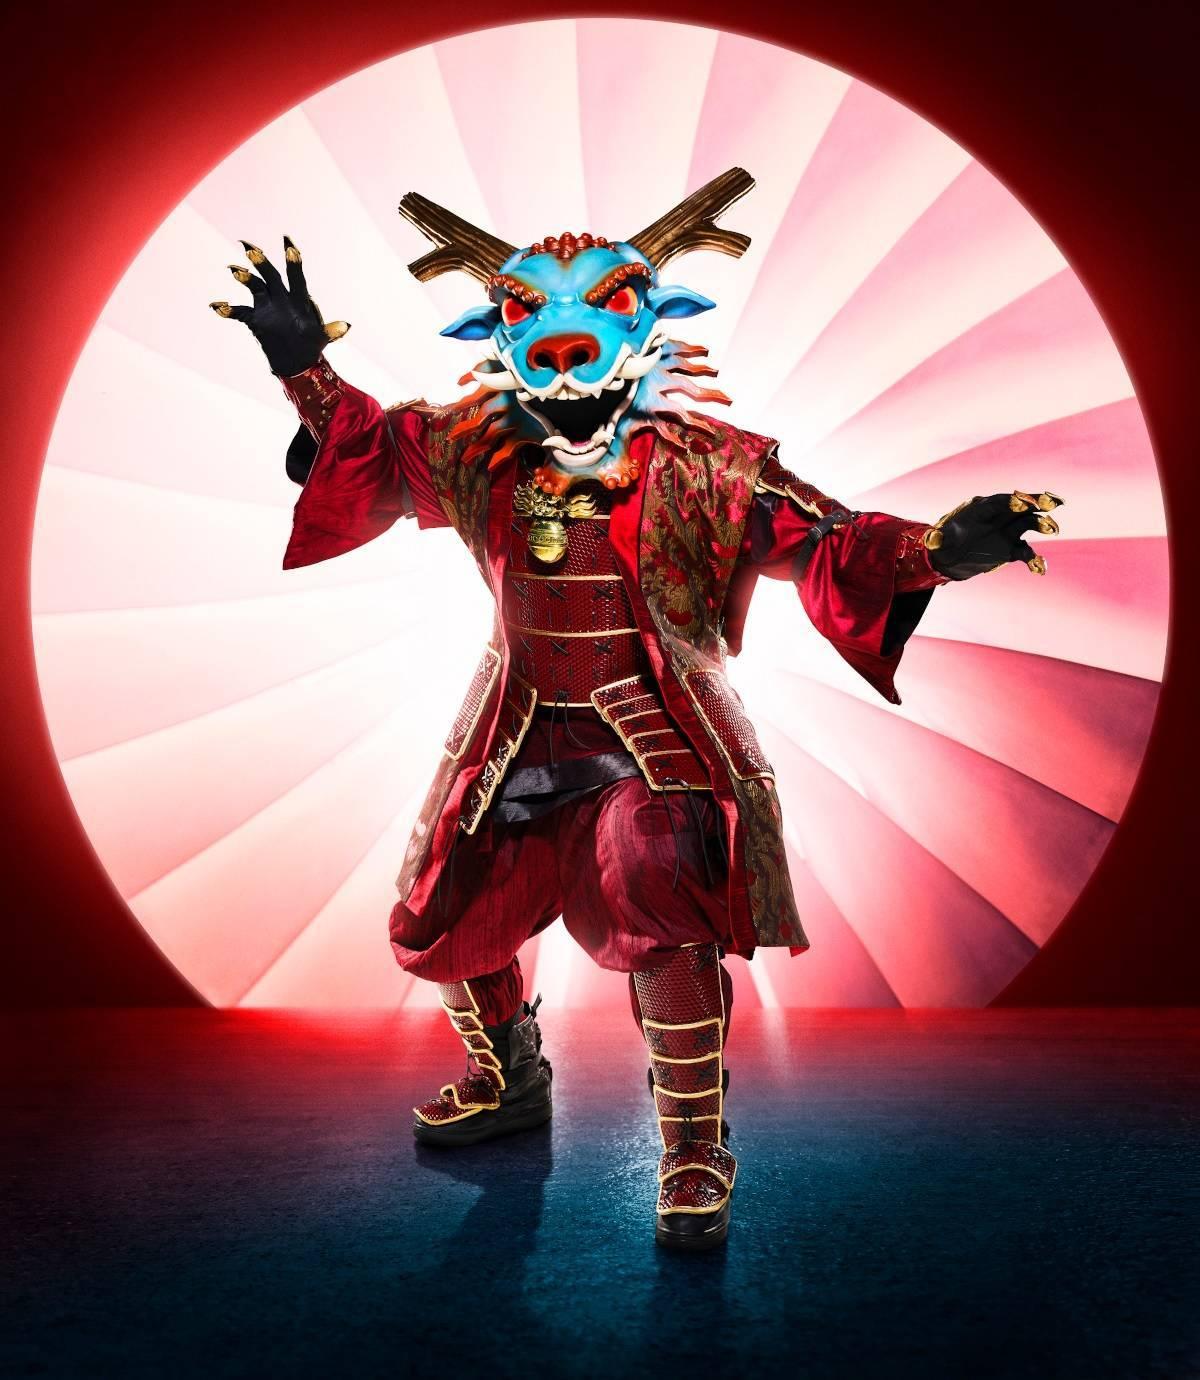 the-masked-singer-dragon-fox-20093492.jpeg?auto=webp%26width=1200%26height=1380%26crop=1200:1380,smart&f=1&nofb=1